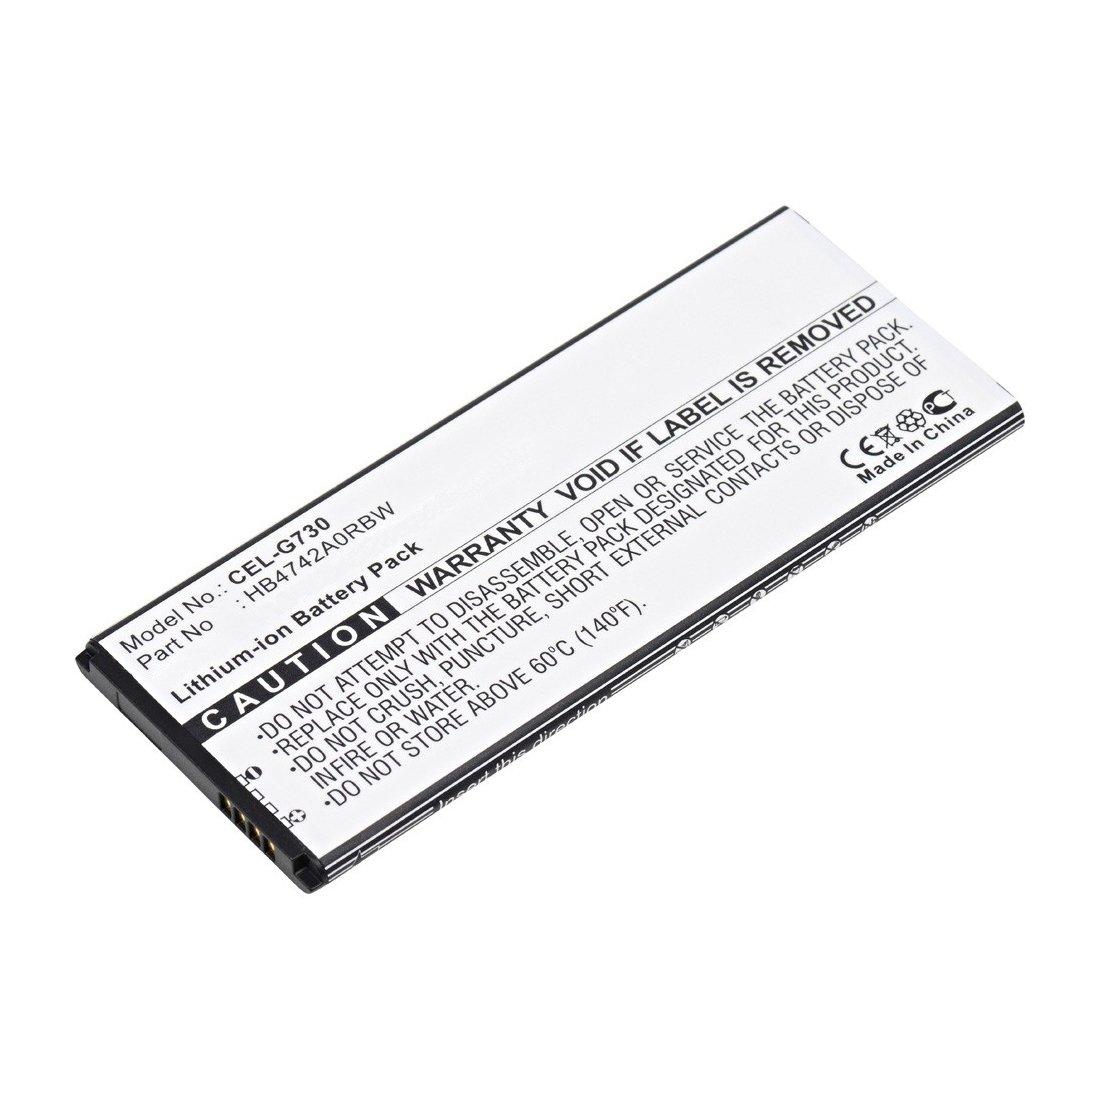 Replacement Huawei Hb A0rbc Li Ion Battery Batterymart